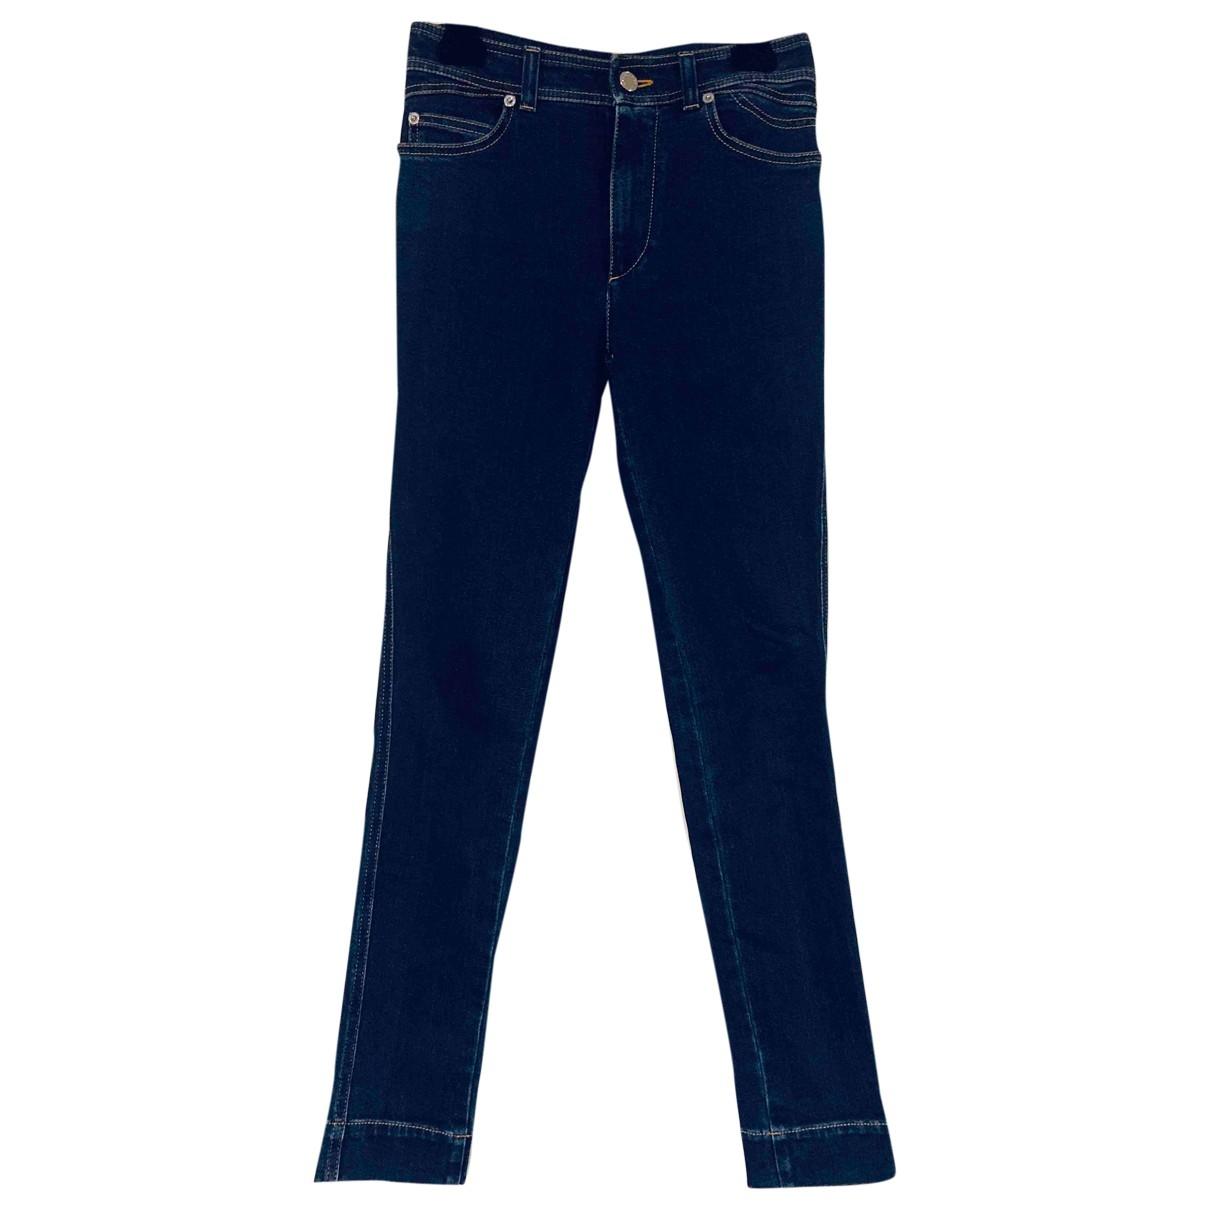 Louis Vuitton \N Blue Cotton - elasthane Jeans for Women 34 FR